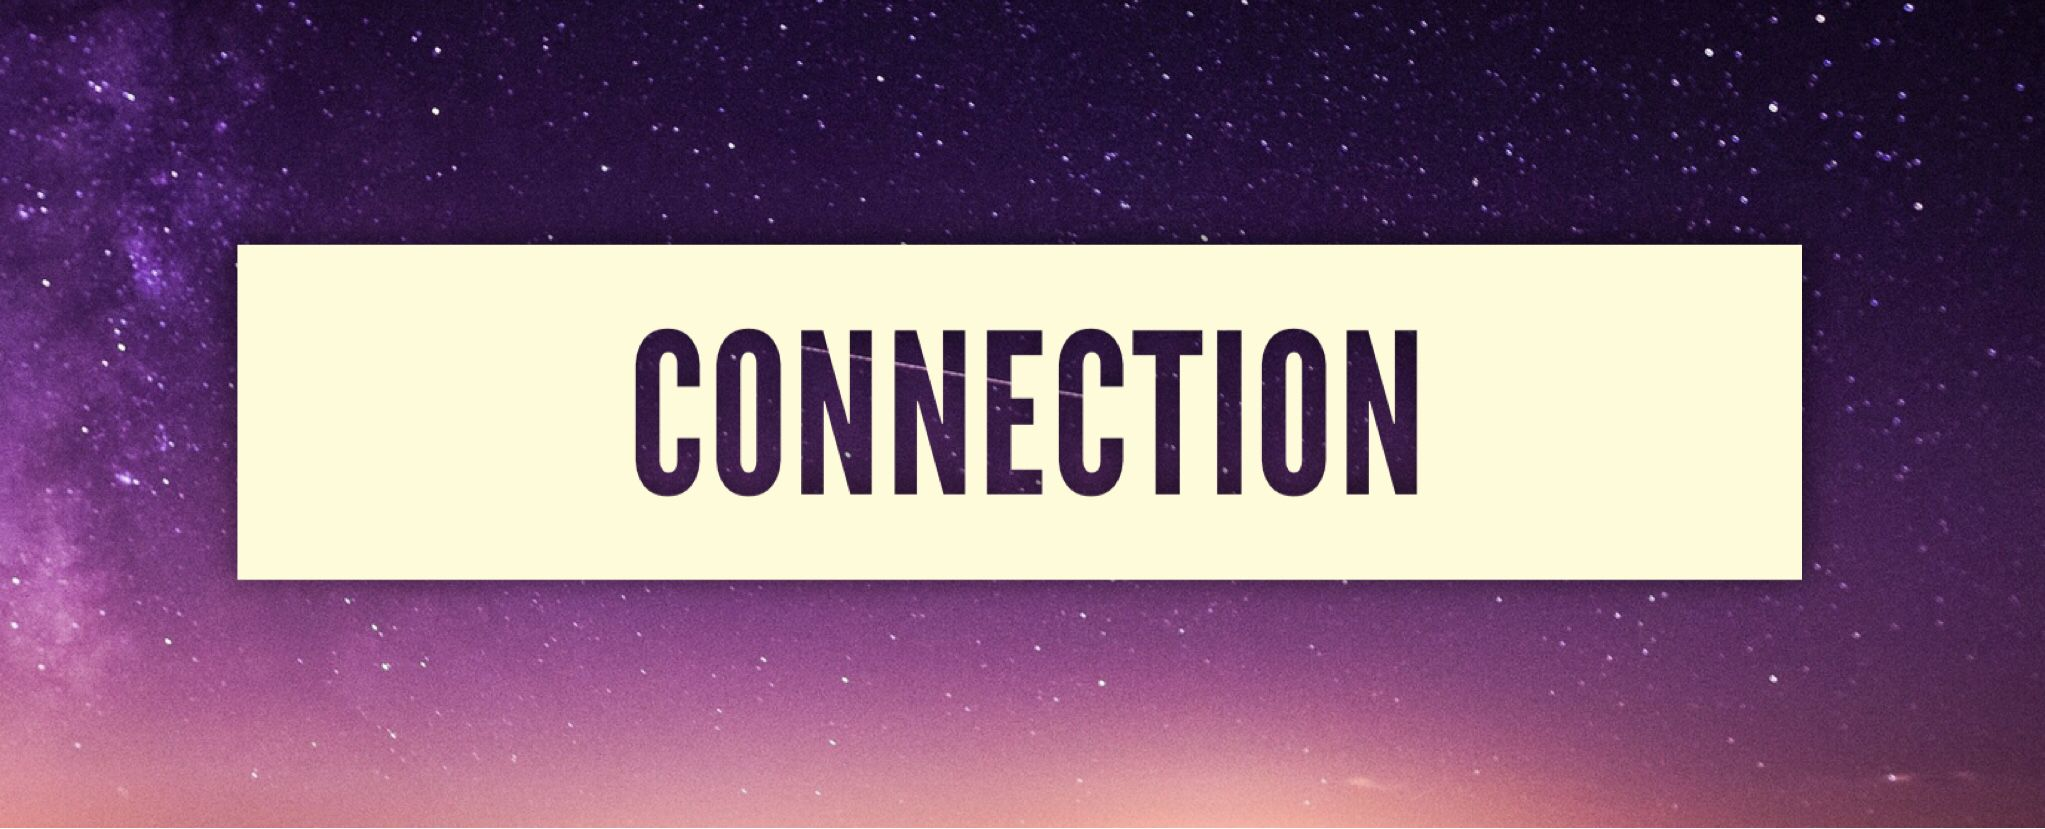 ✨ #thewakeupconcept #connection #happy #healing #awakening #enlightenment #selflove #selfhealing #concept #meditation #happiness #highvibration #frequency #despertar #amor #meditar #love #vitalforce #exerciseforthesoul #soul #peace #gratitude